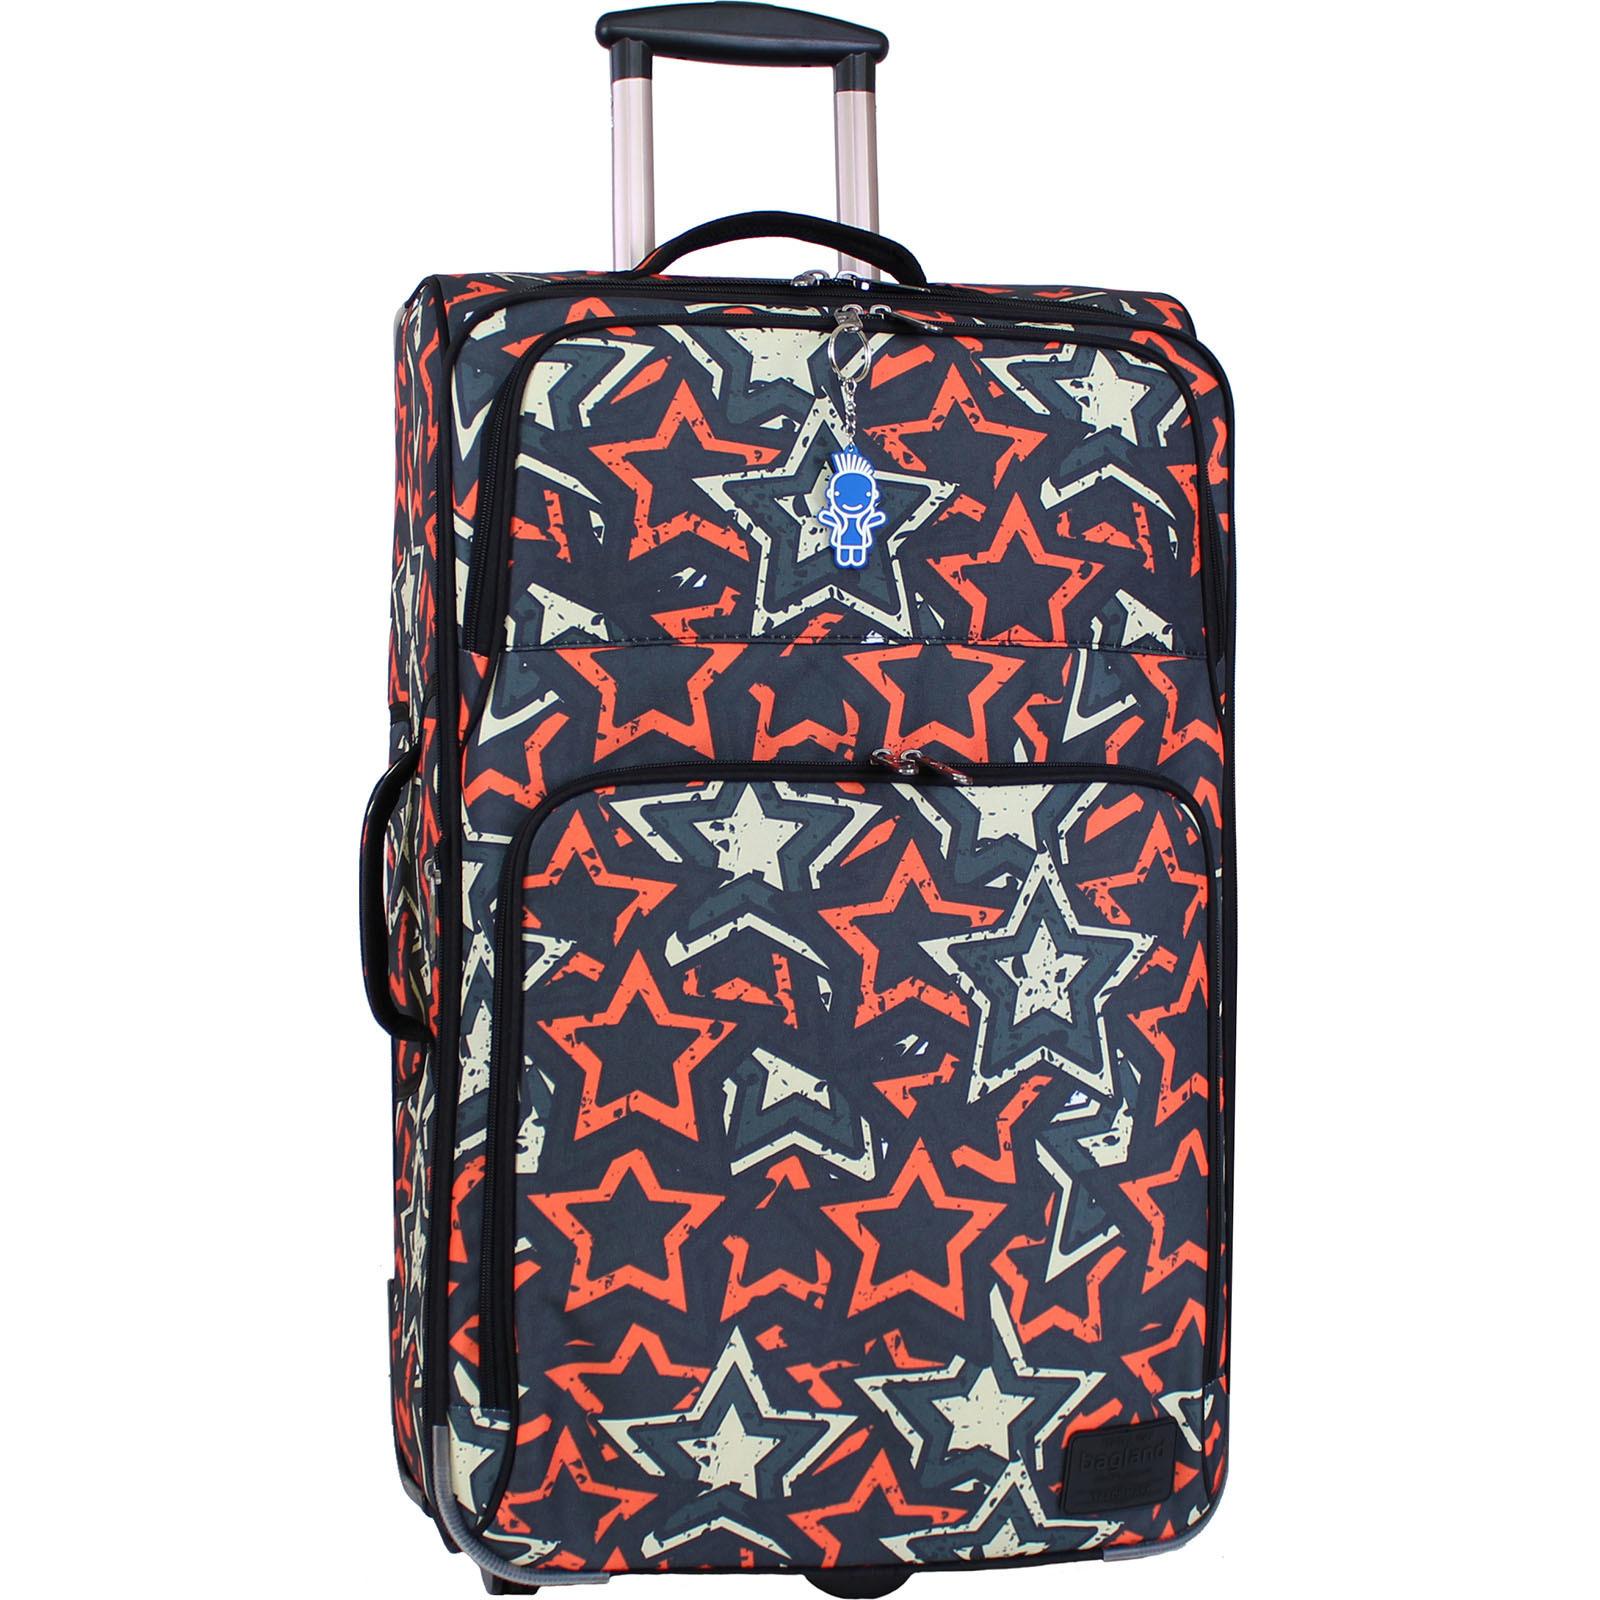 Дорожные чемоданы Чемодан Bagland Леон большой дизайн 70 л. сублімація 185 (0037666274) IMG_9793.JPG